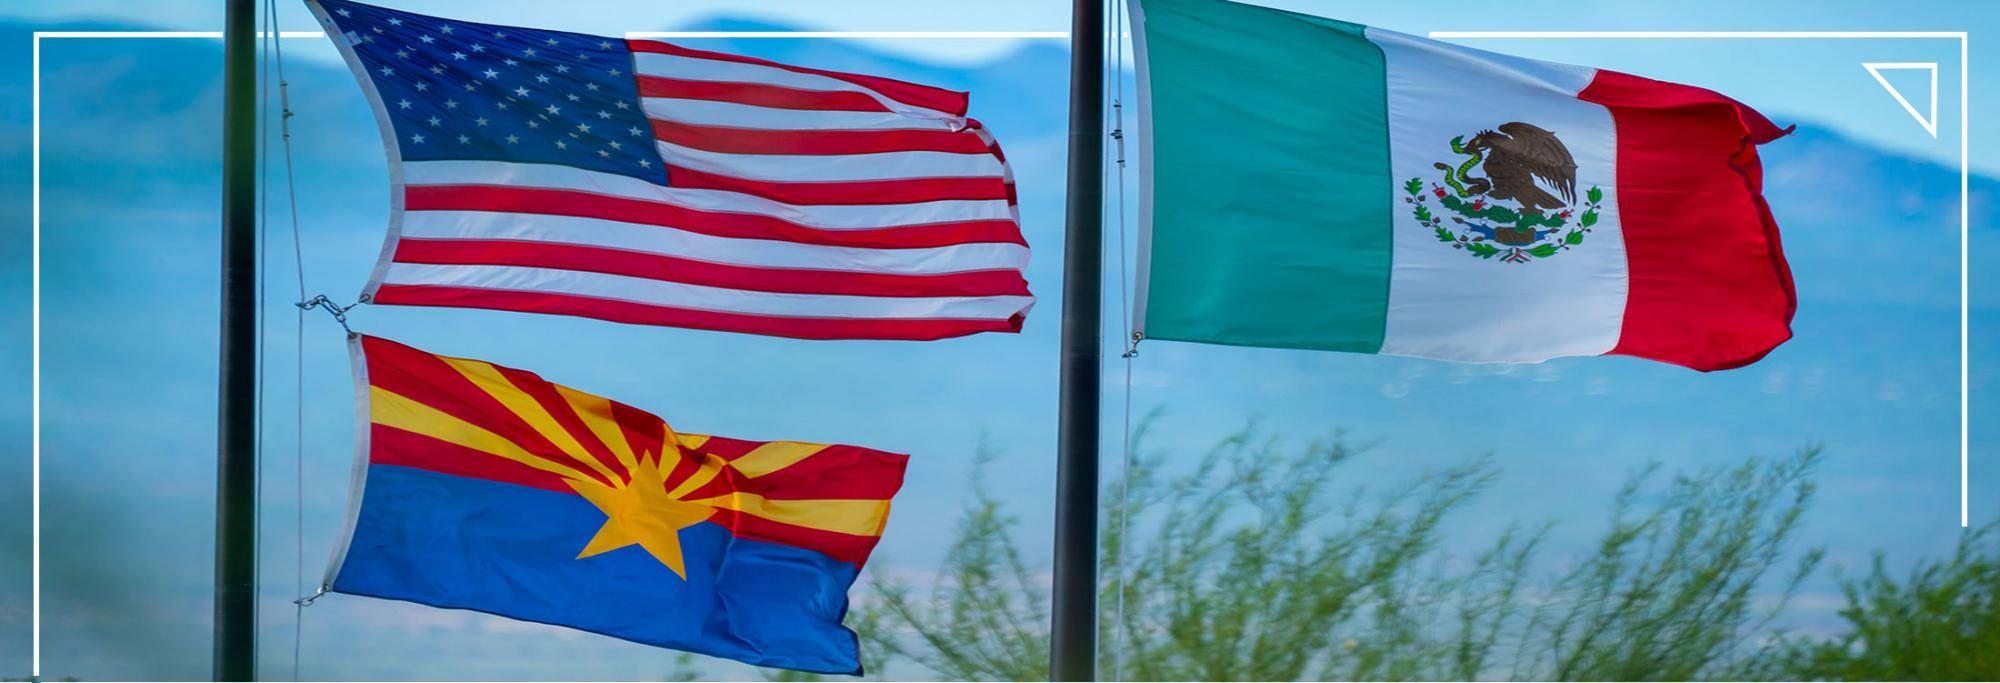 Arizona-Mexico Economic Indicator - Arizona's Trade and Competitiveness in the U.S.-Mexico Border Region